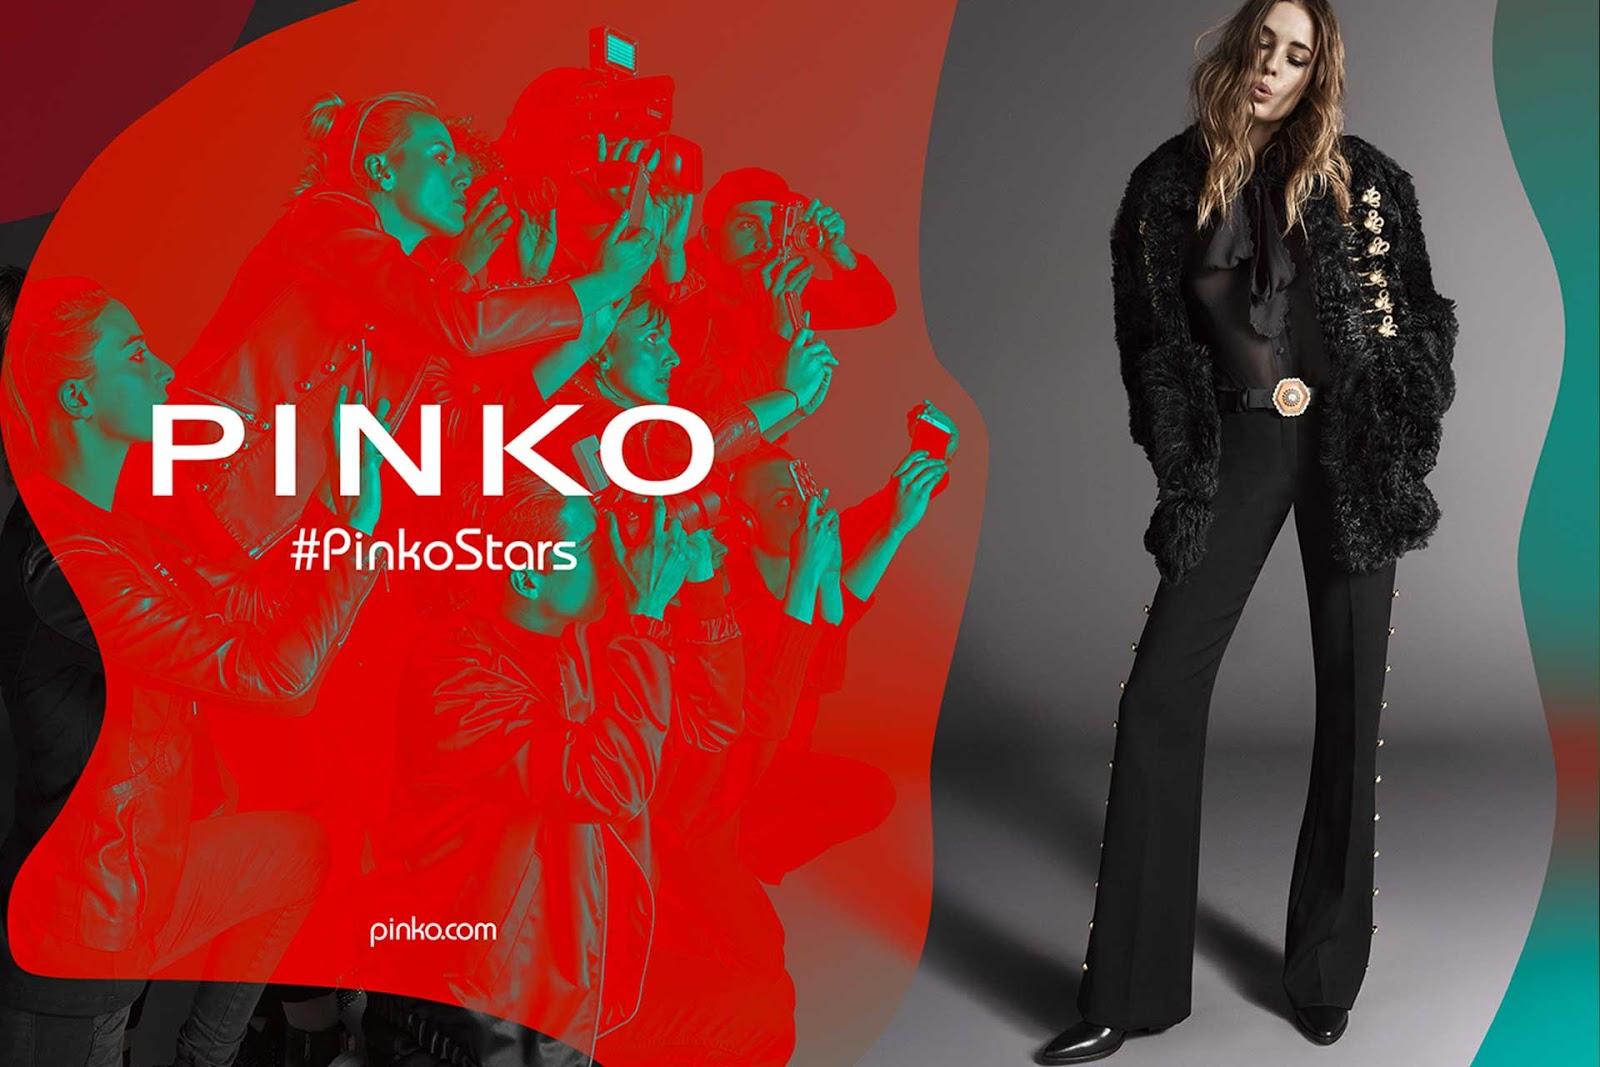 Pinko ADV FW 2016/2017 | Carlotta Manaigo | Pinko | Numéro Tokyo | Catherine Newell-Hanson | Numerique Retouch Photo Retouching Studio